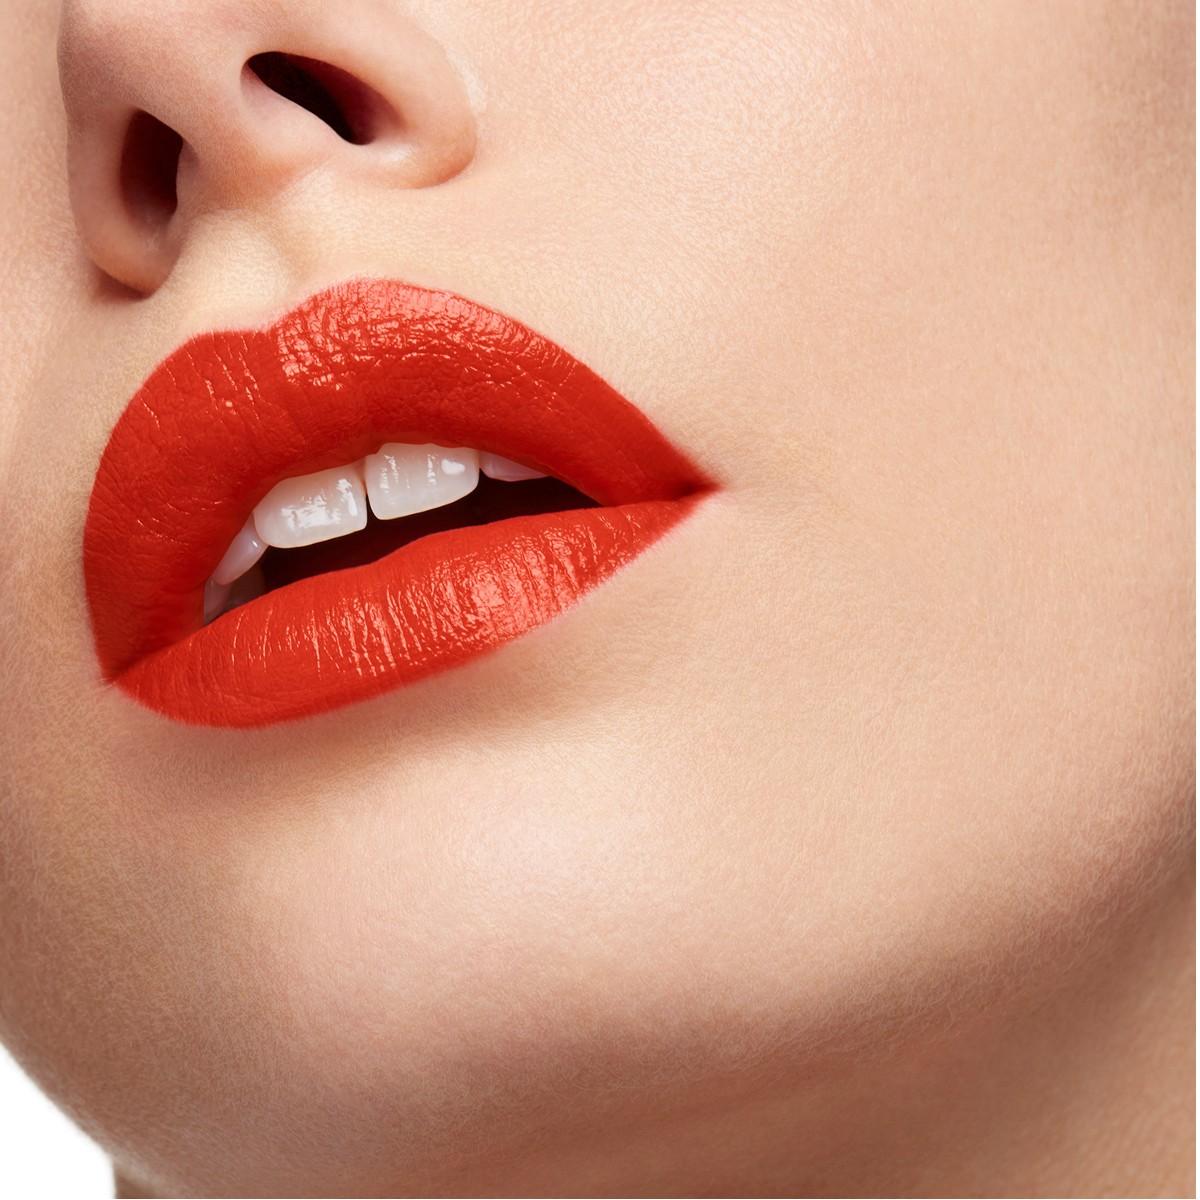 Beauty - Theophila - Christian Louboutin